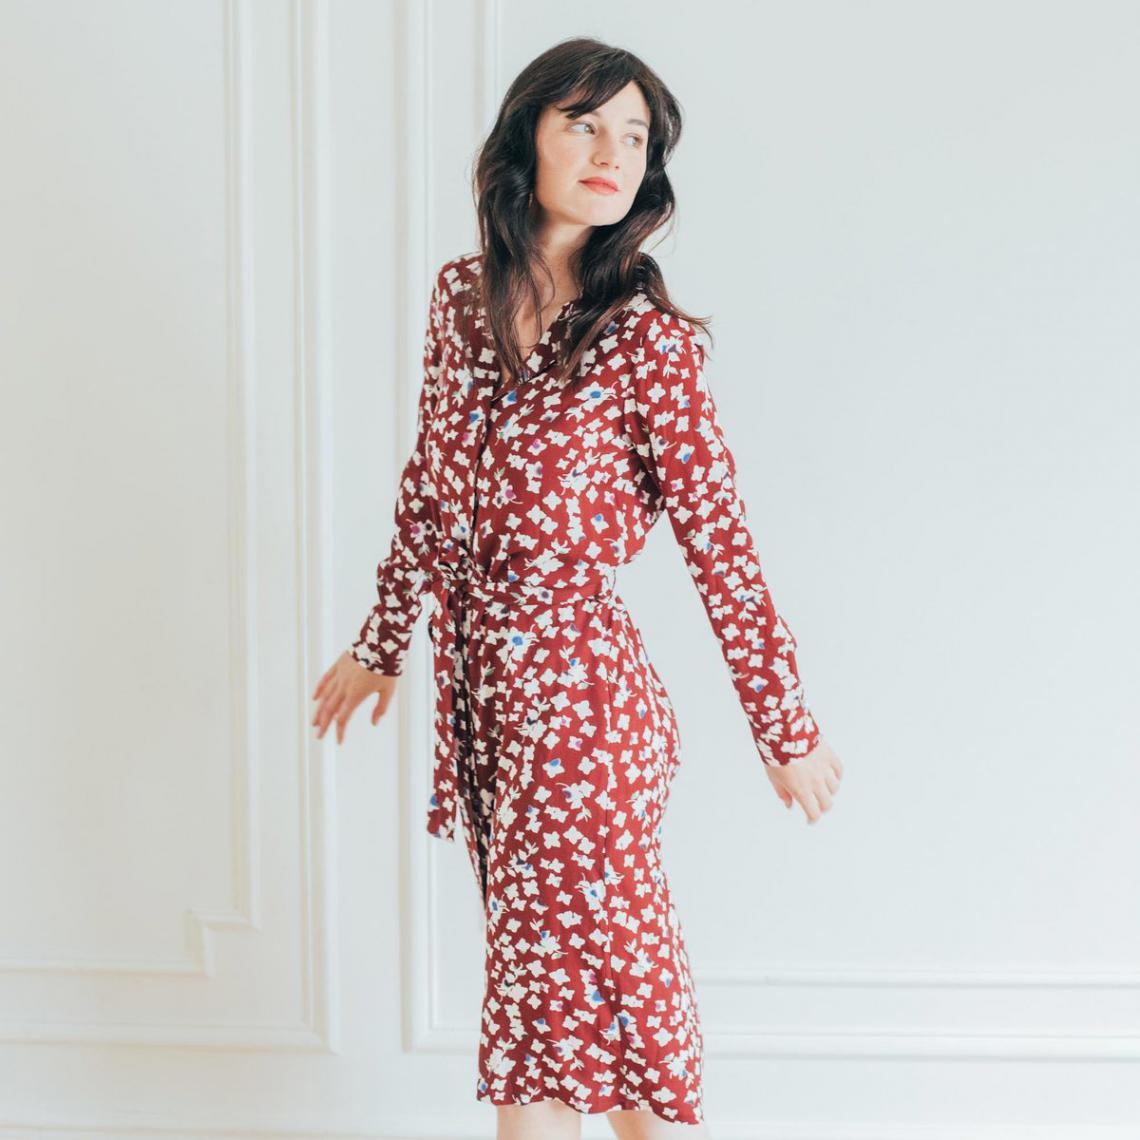 Robe ceinturée col tailleur Jade Réédition - Robe Komara BORDEAUX 36 - Modalova